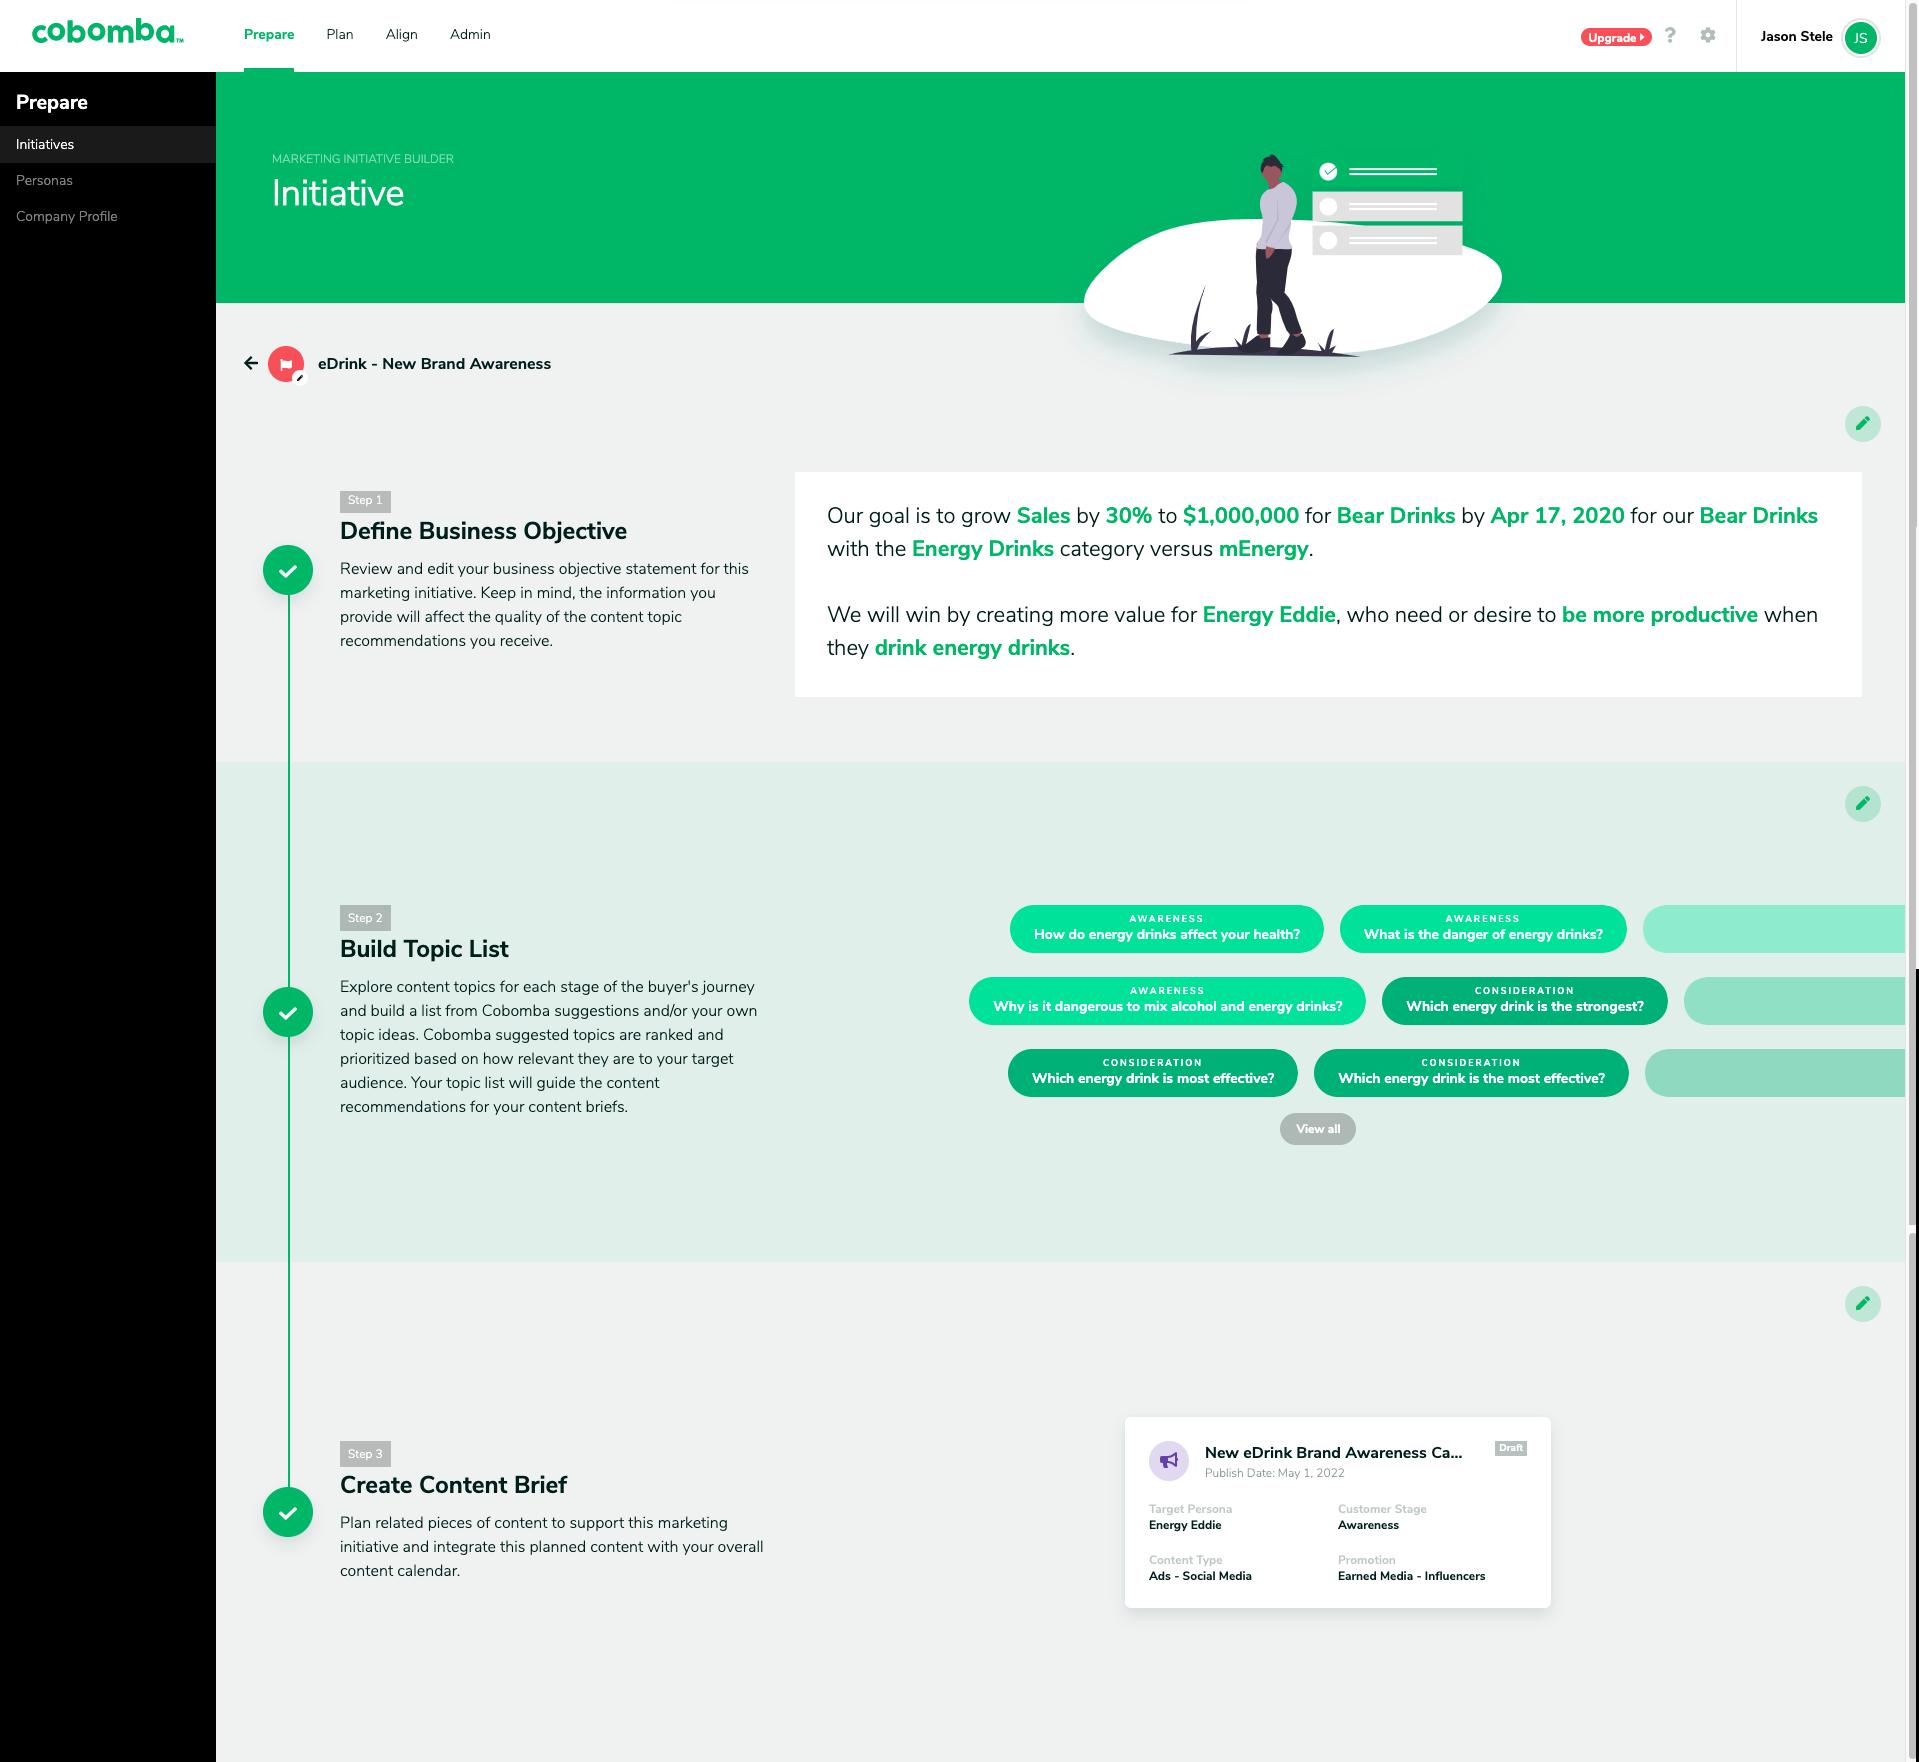 Cobomba Marketing Planning Platform driven by AI